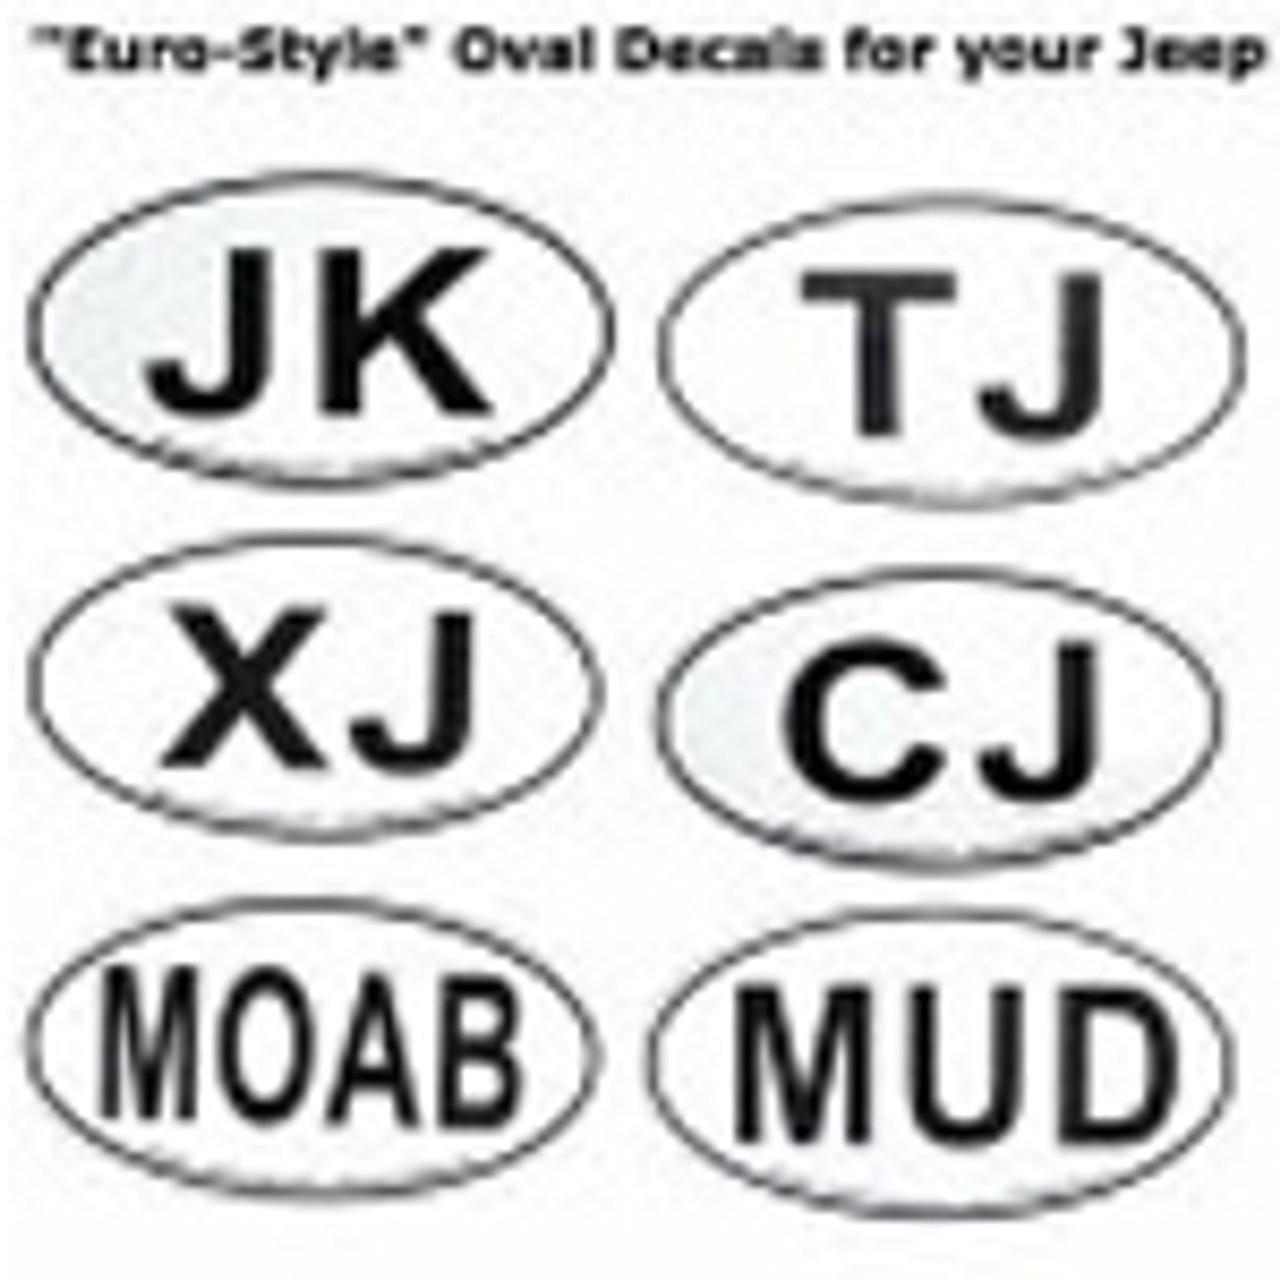 Custom Oval Jeep Decals